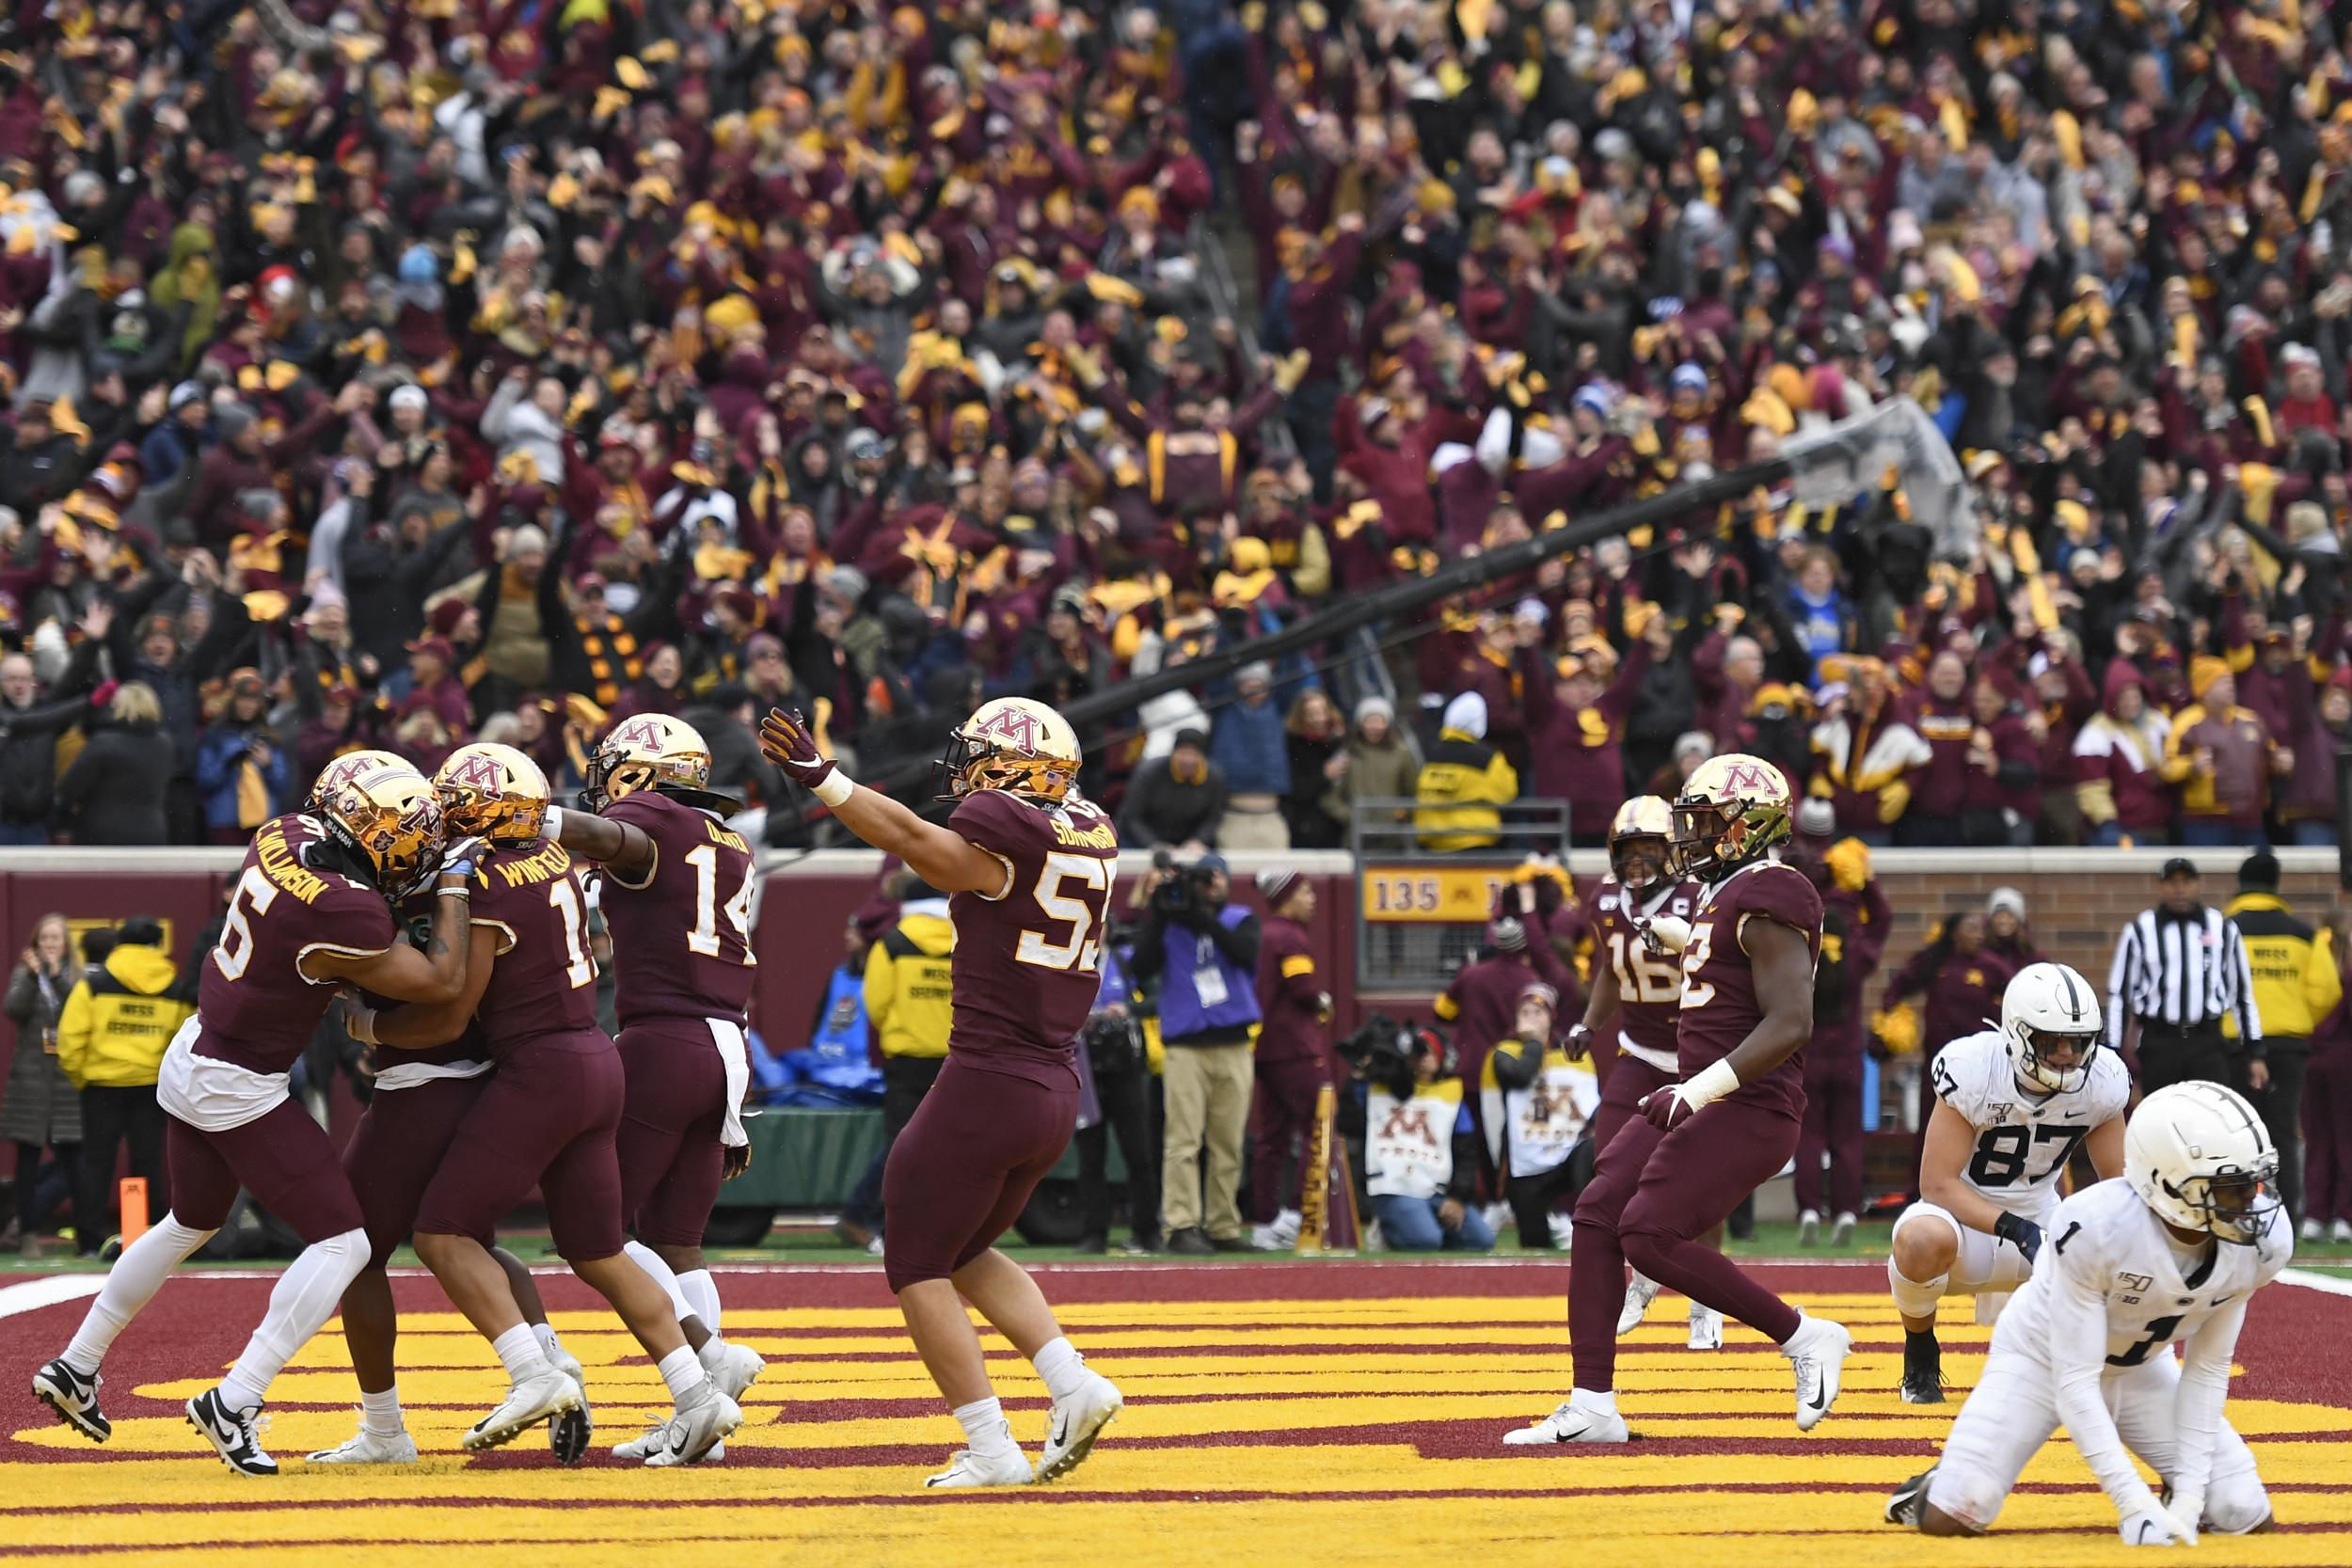 College Football 2019 Where To Watch Minnesota Vs Iowa Tv